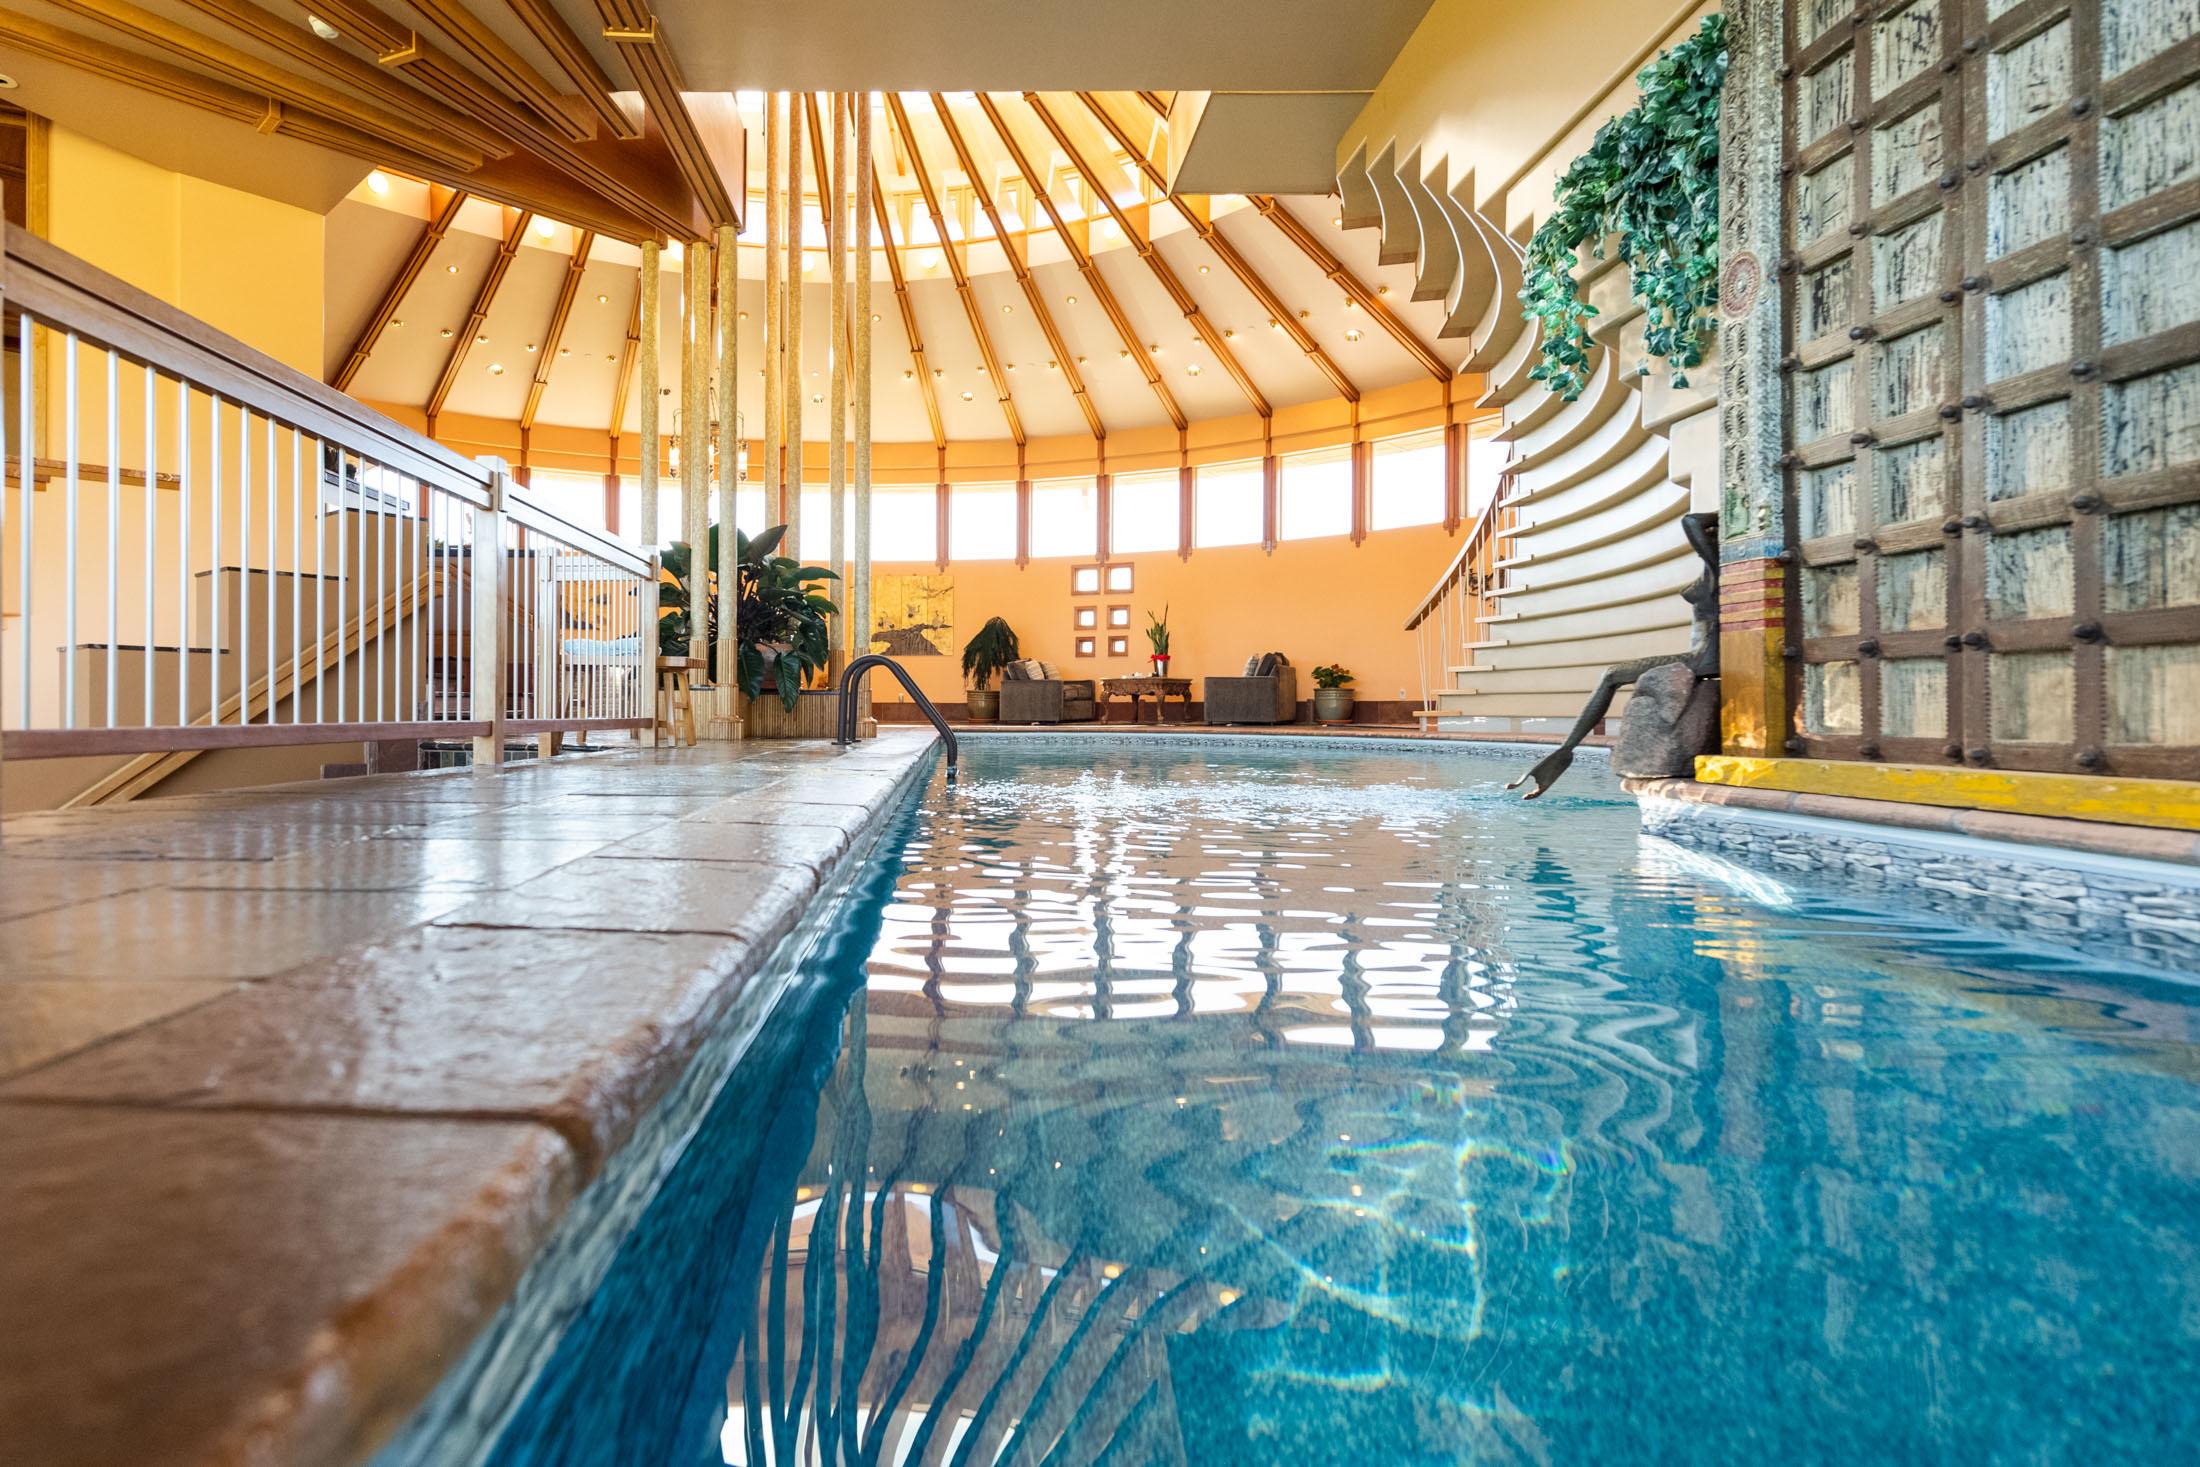 Detalle de la piscina / Sotheby's International Realty